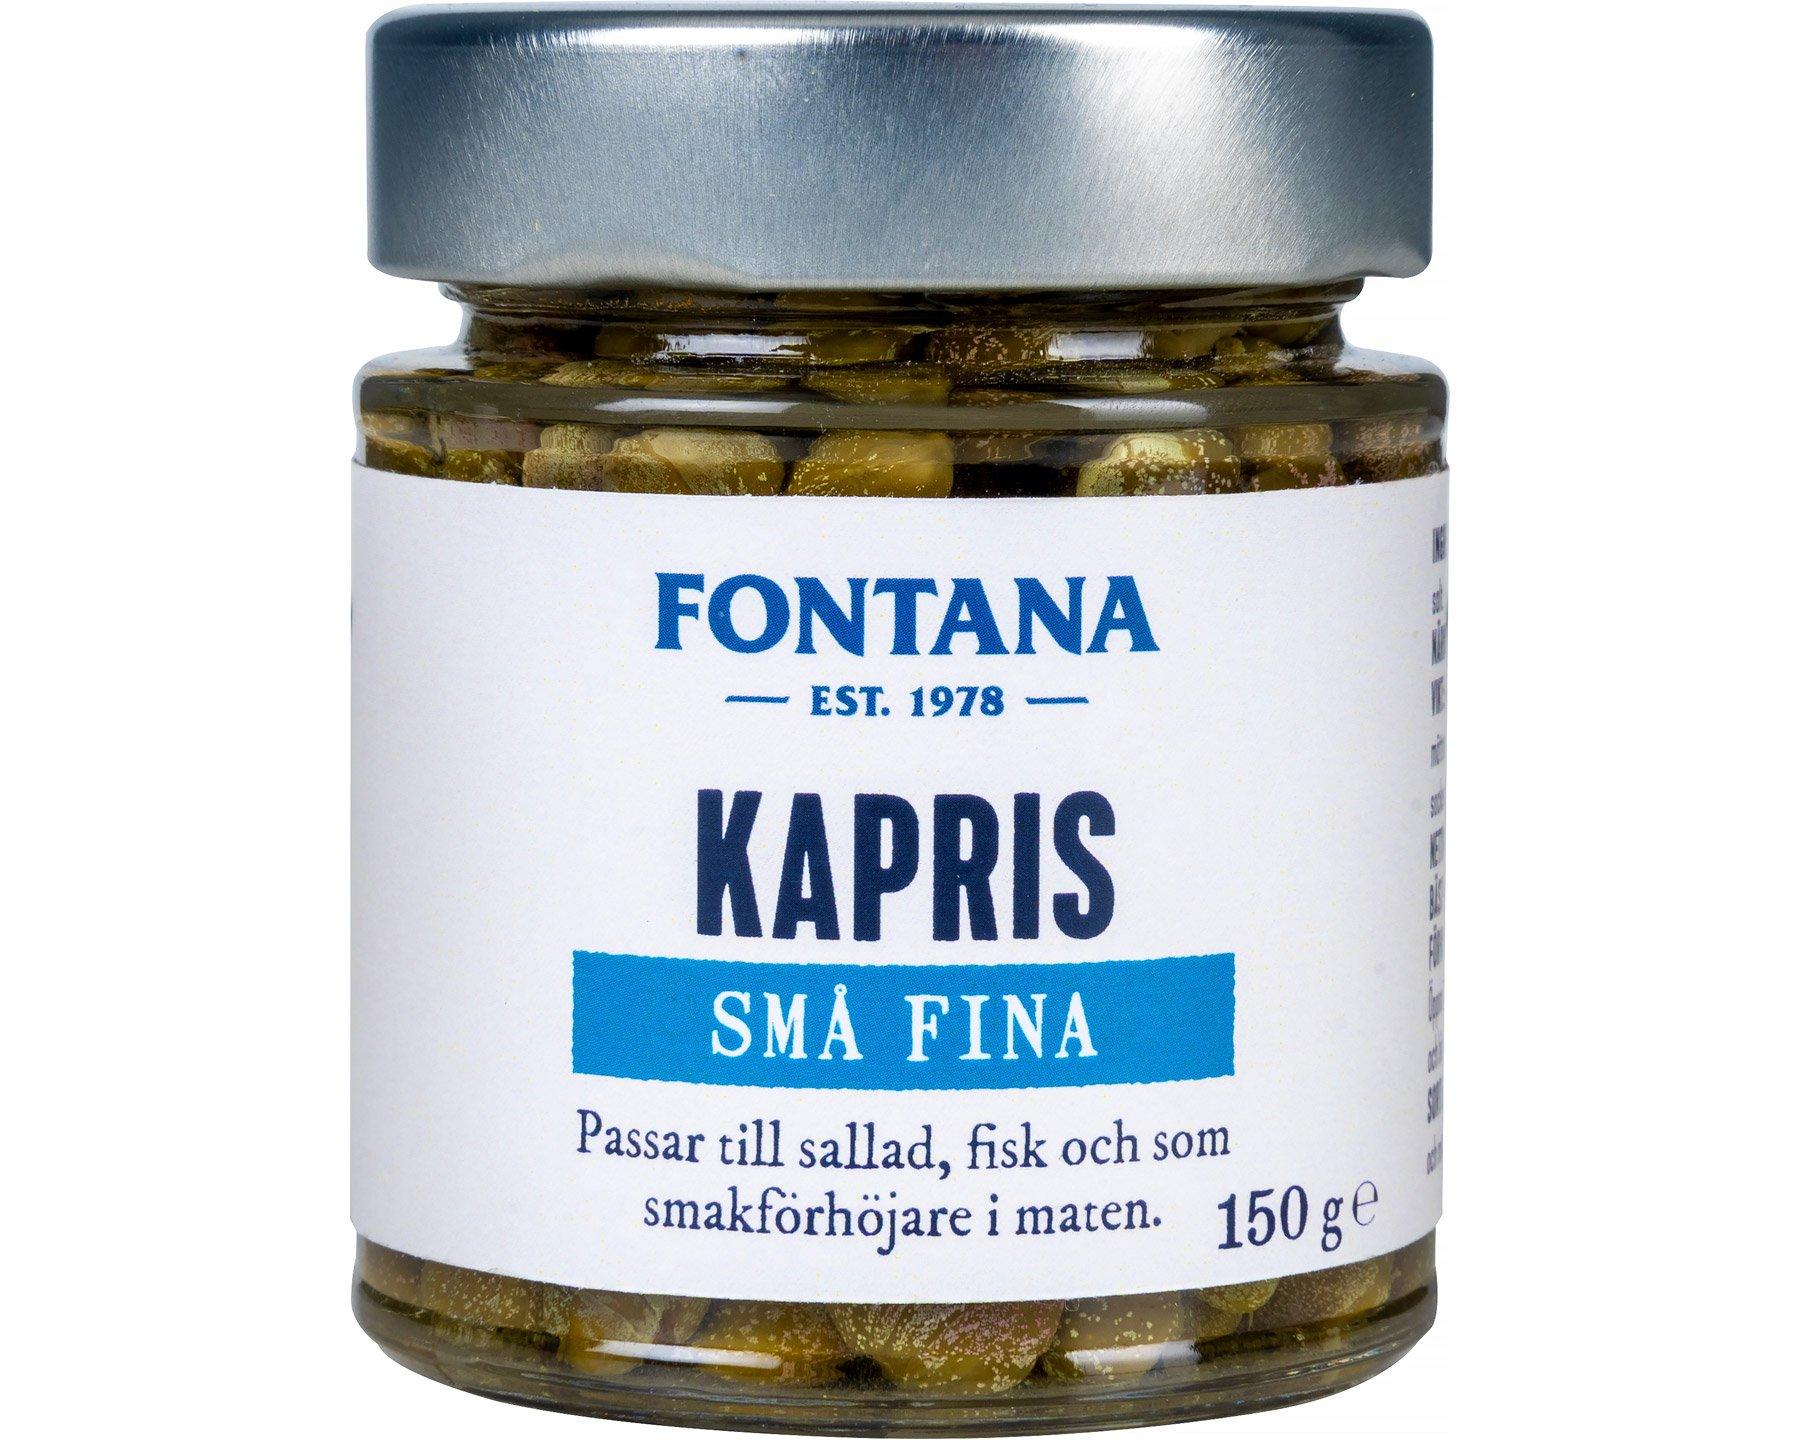 Fontana Kapris små fina 150 g